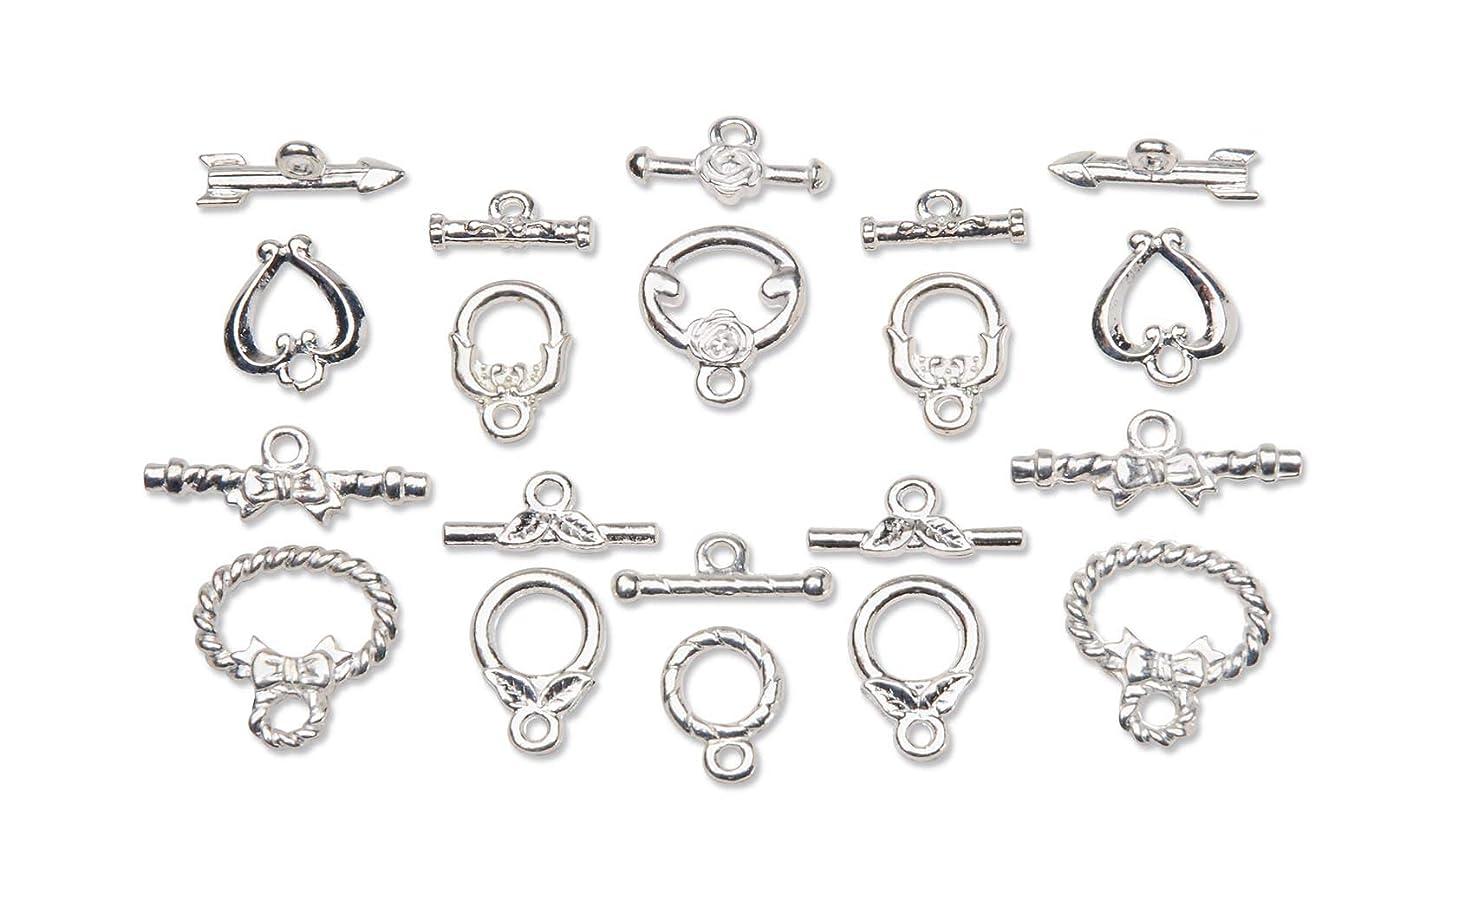 Jewelry Designer 1990-40 Bv Toggle Clasp Set BRT Silver 10 Pc